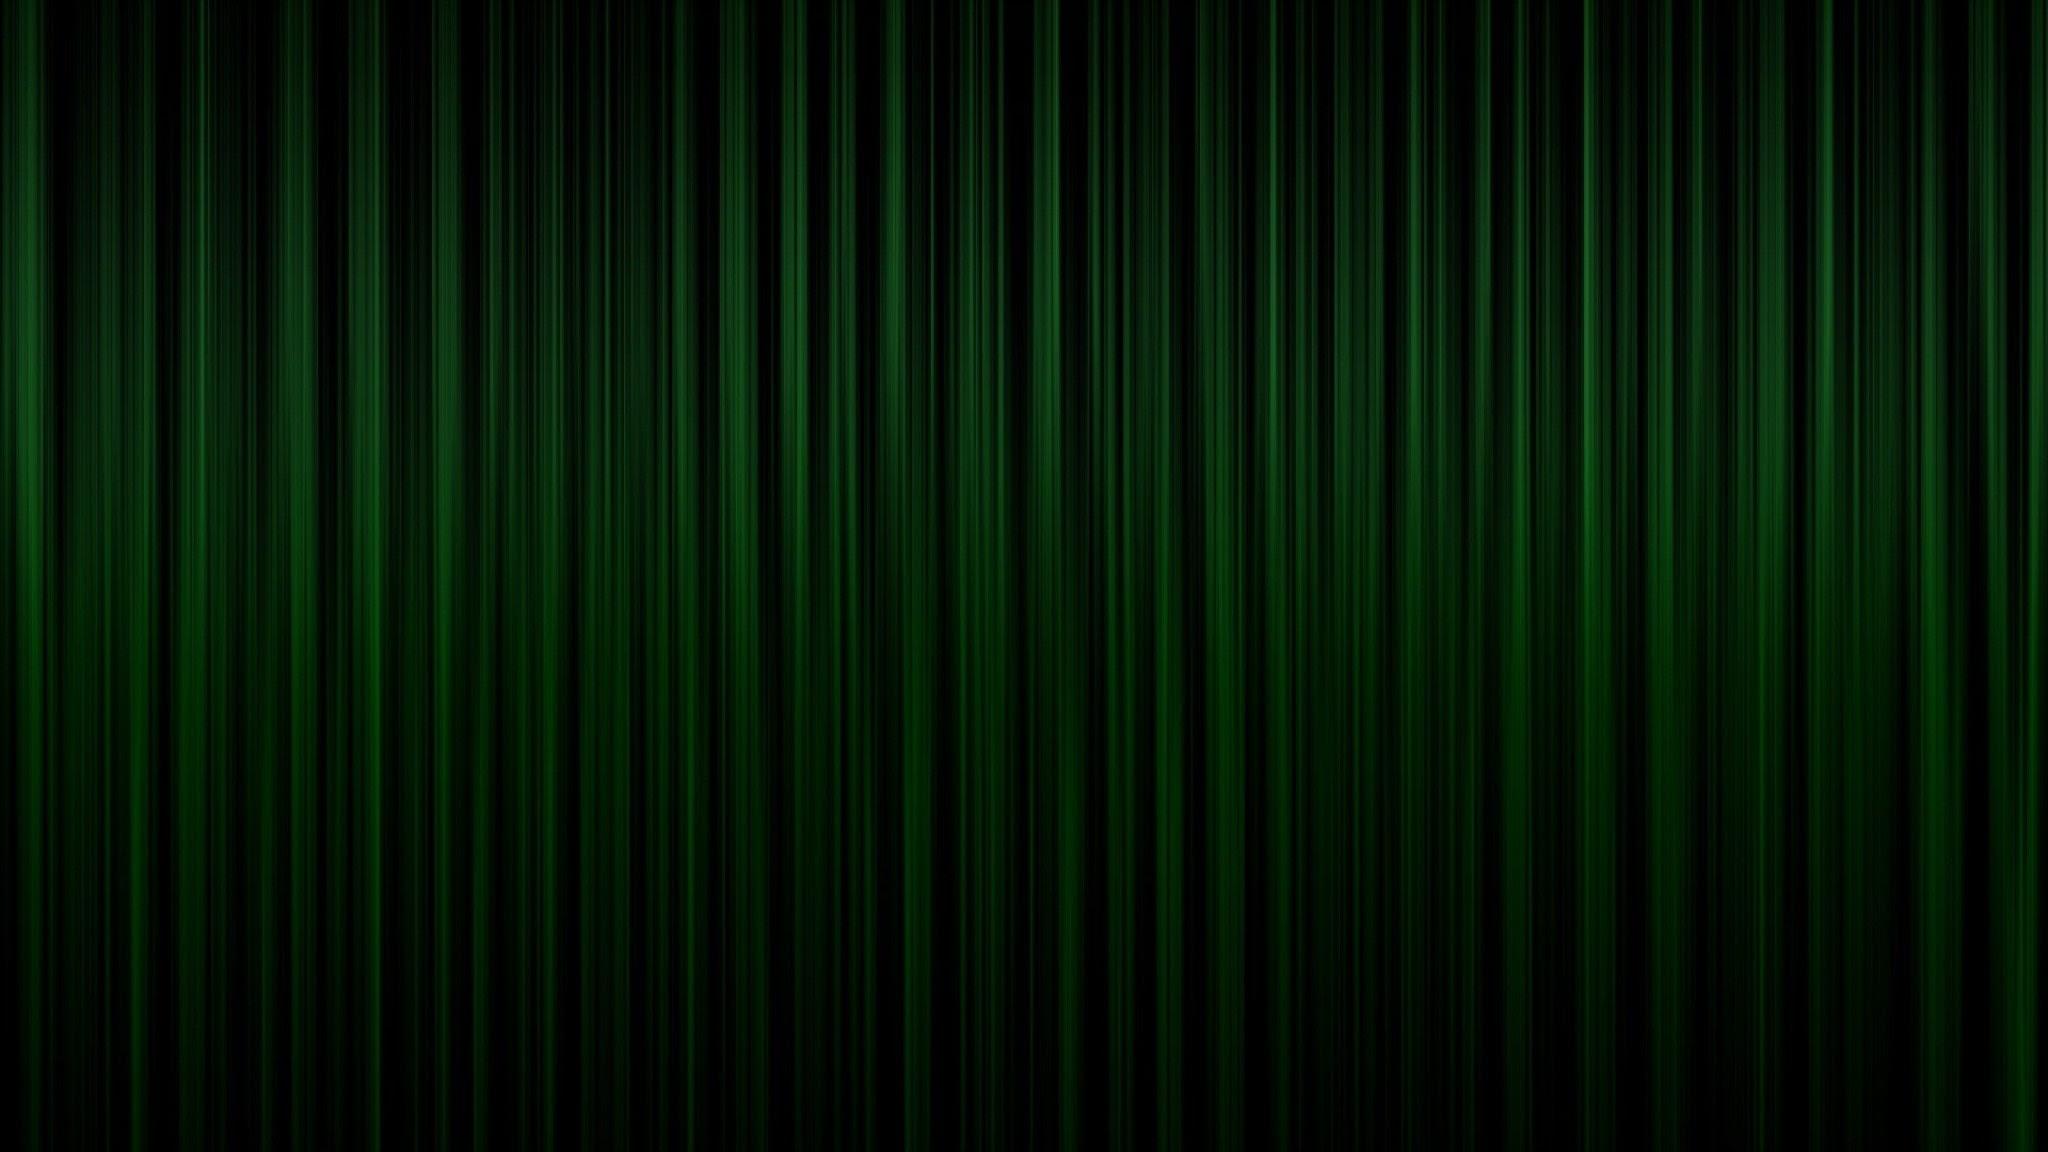 Dark Green Wallpaper Hd 59 Images